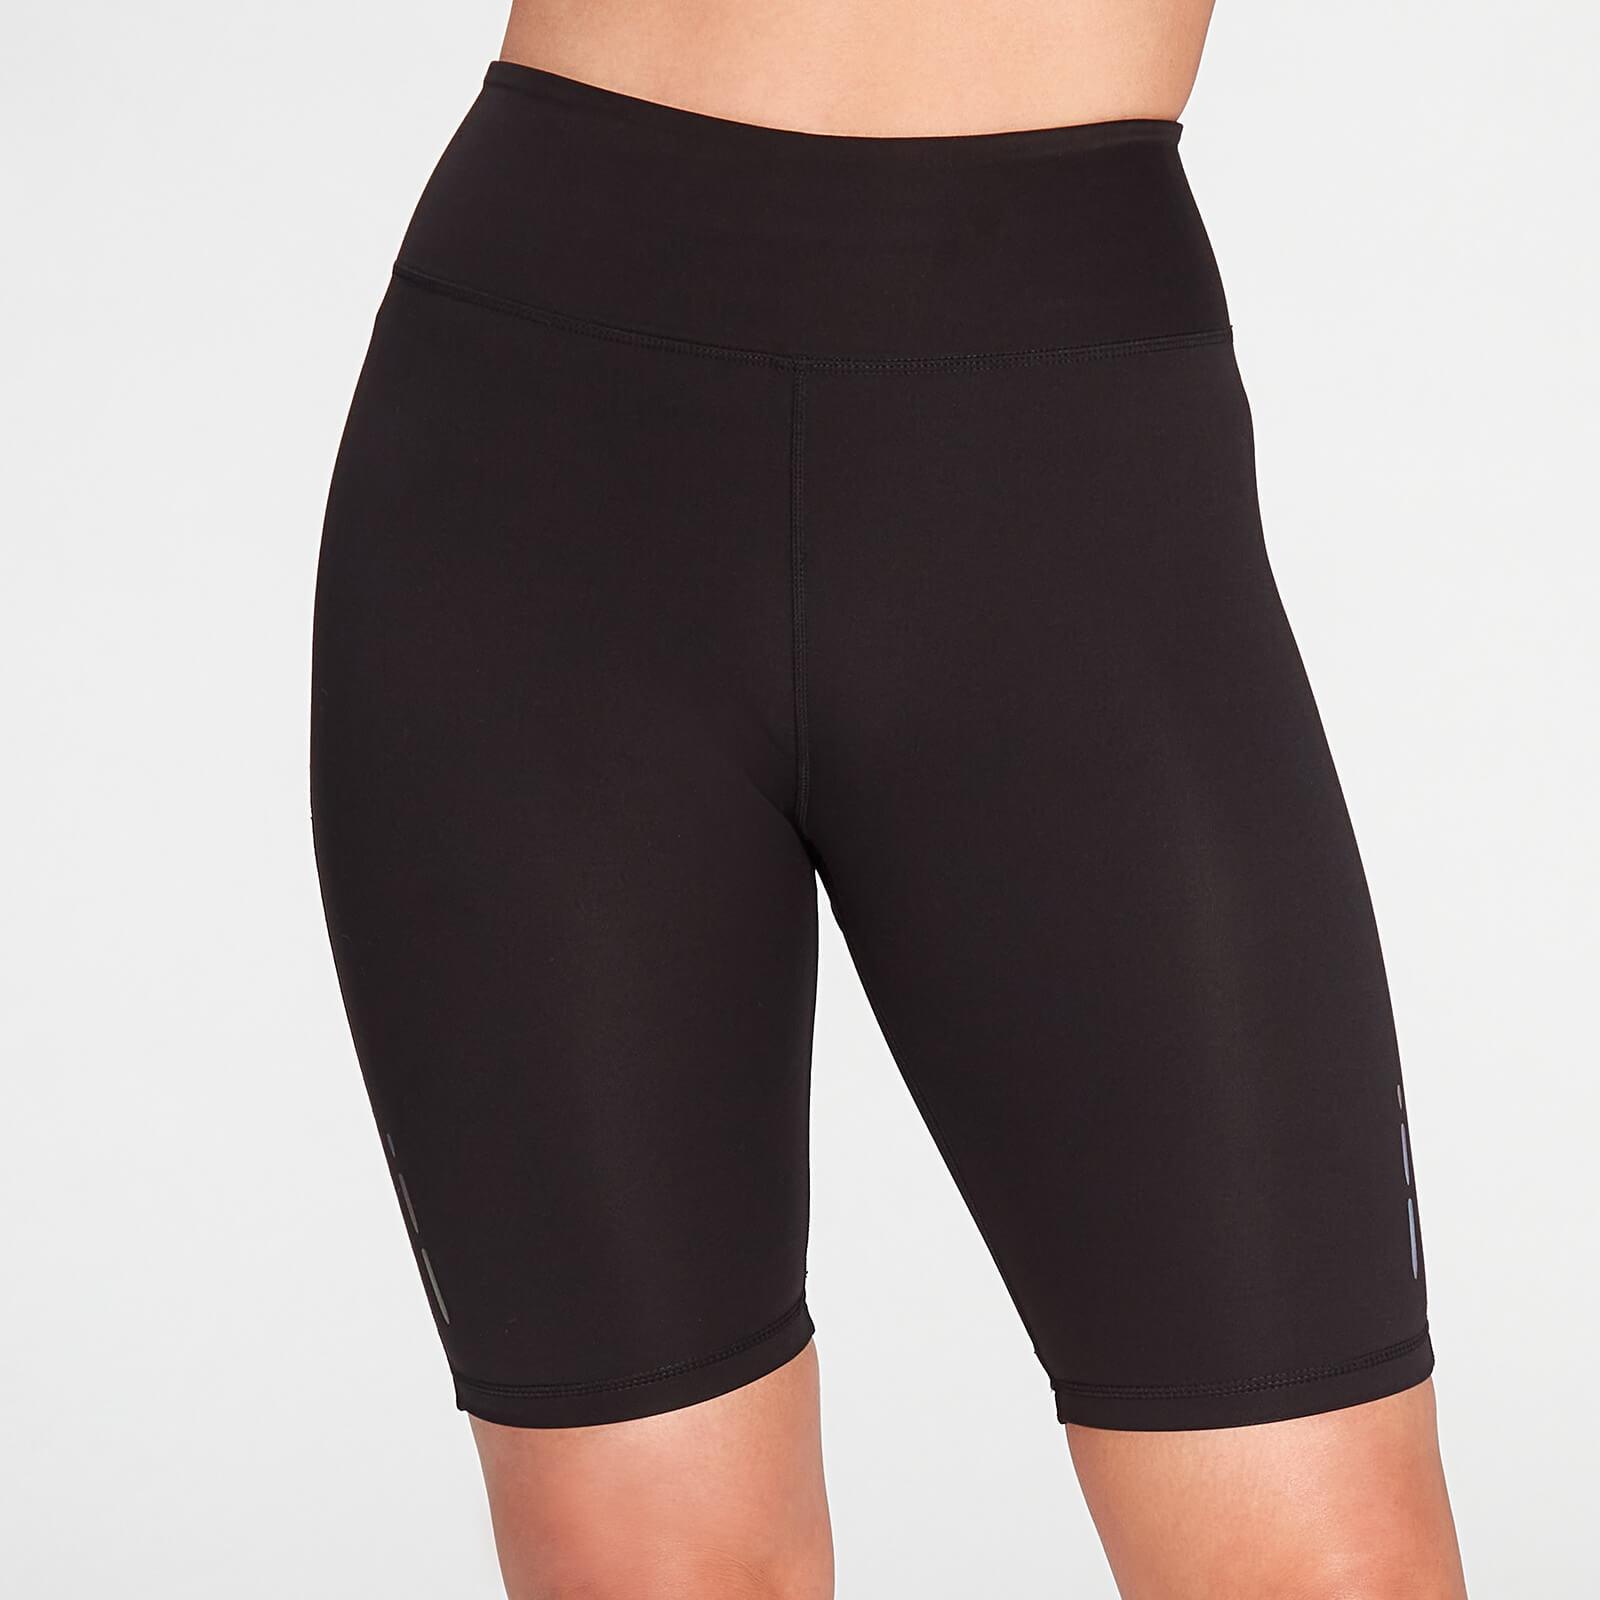 Купить MP Women's Power Ultra Cycling Shorts- Black - S, Myprotein International